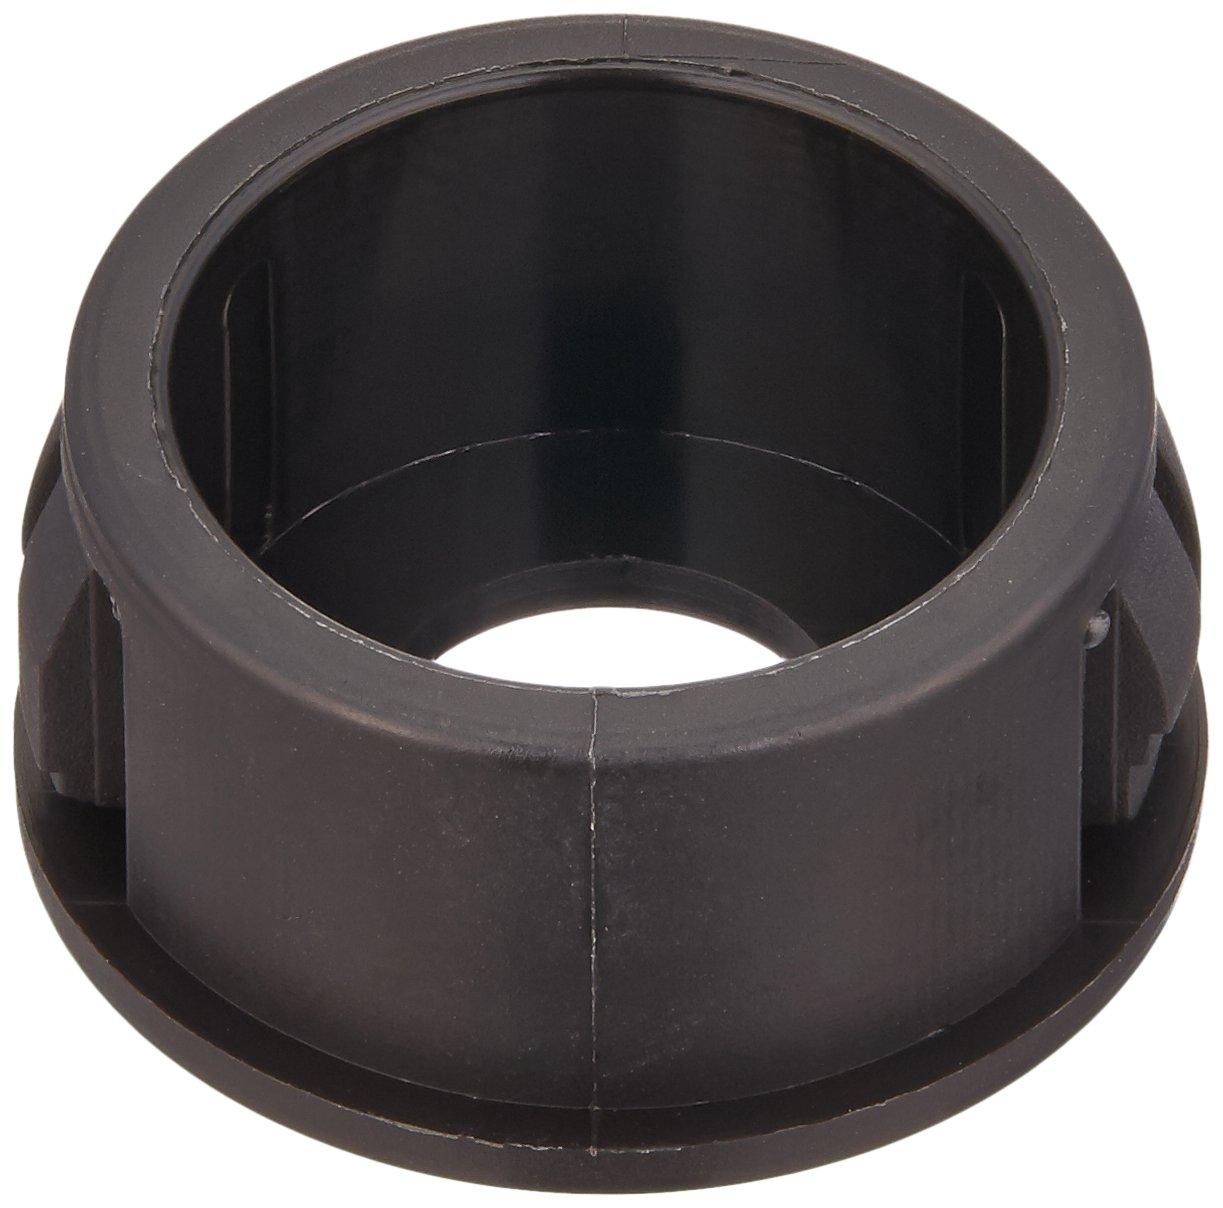 Hard-to-Find Fastener 014973170448 Regular Snap Bushing, 3/8-Inch, 15-Piece